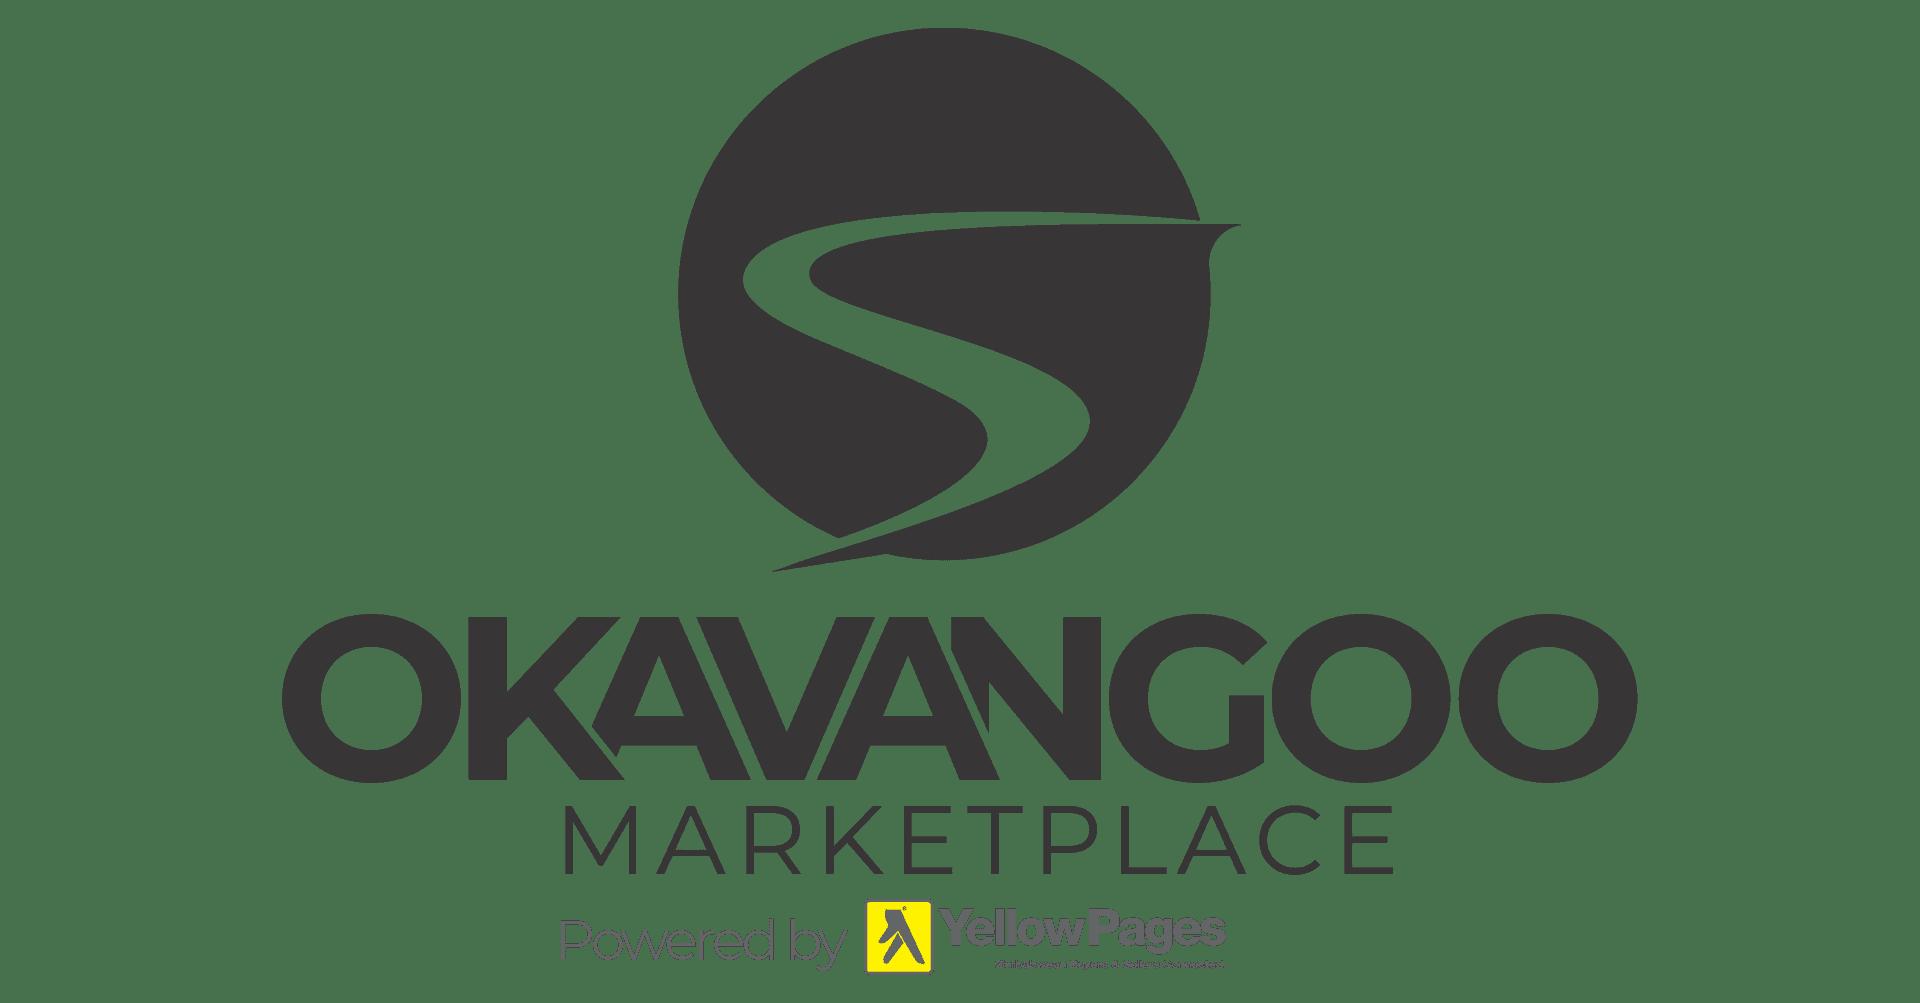 Okavangoo Market Place-Zimbabwe Merchants In One Place logo